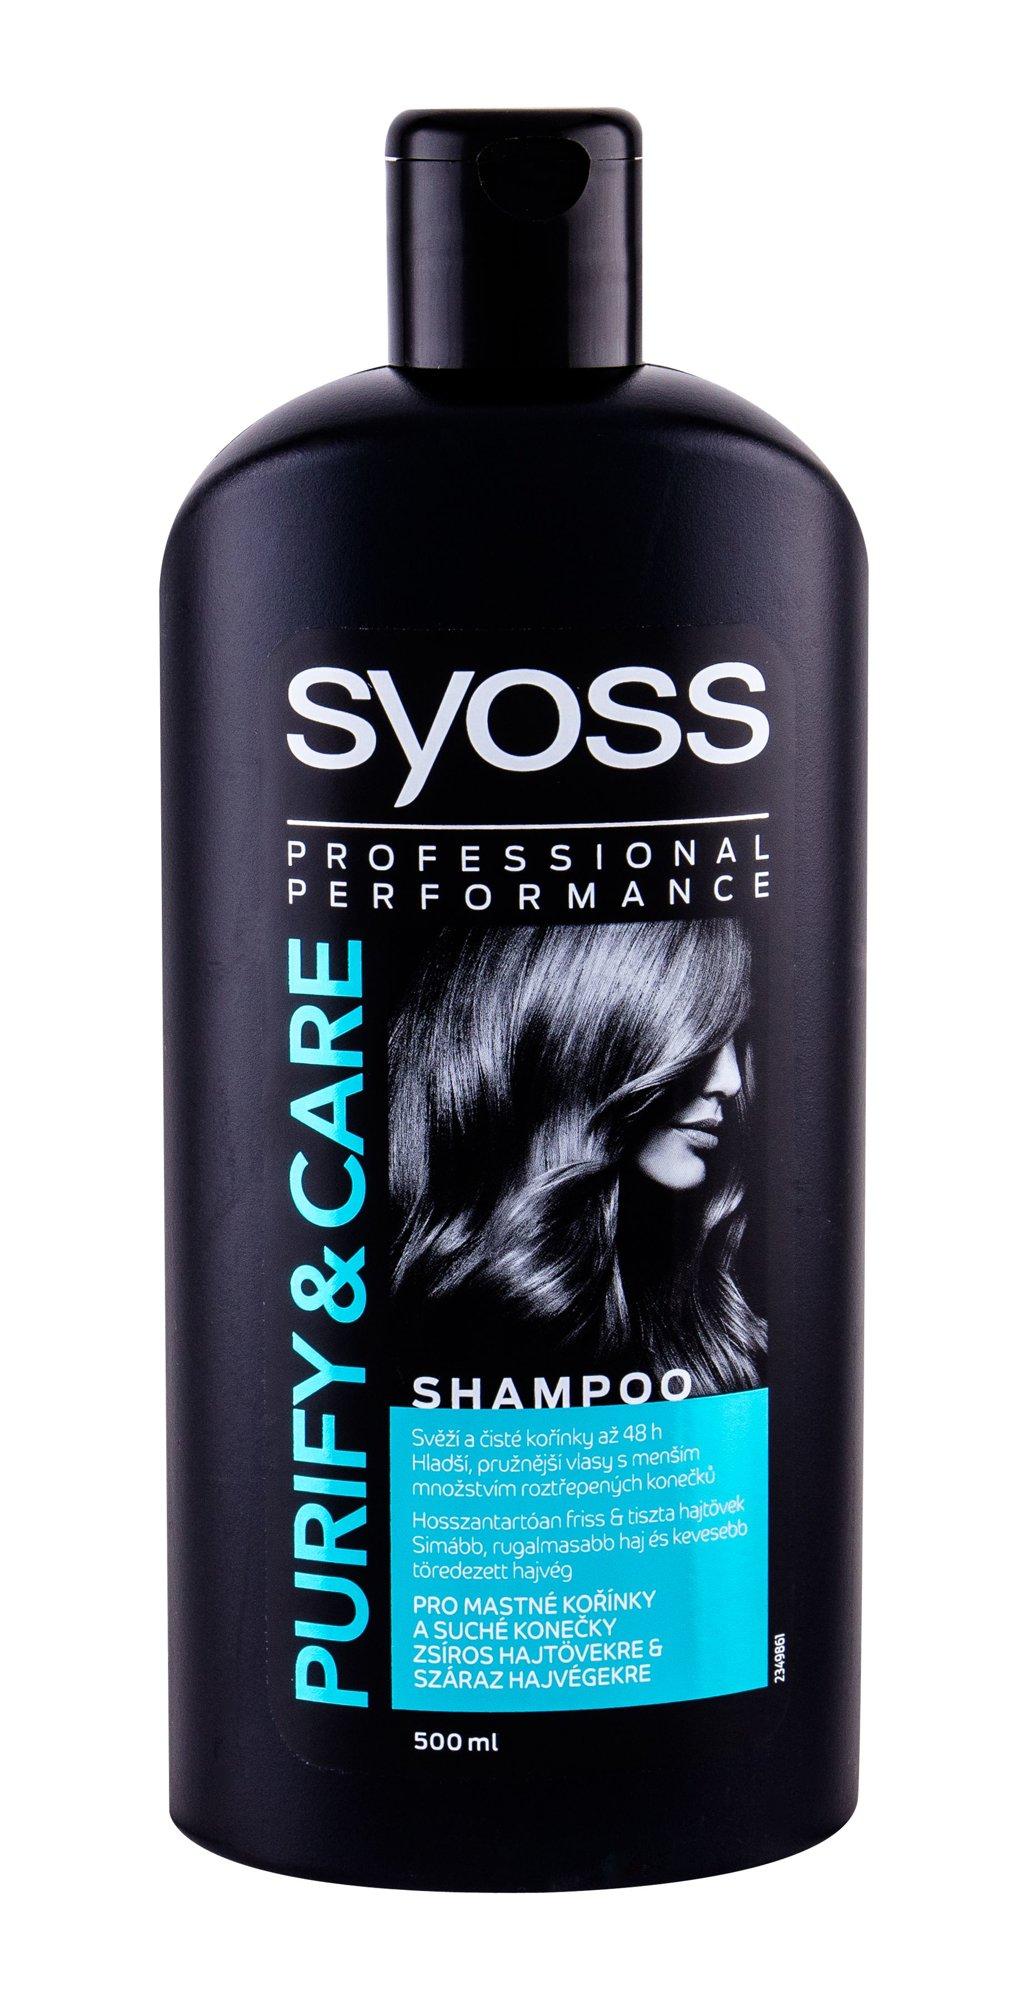 Syoss Professional Performance Purify & Care Shampoo 500ml